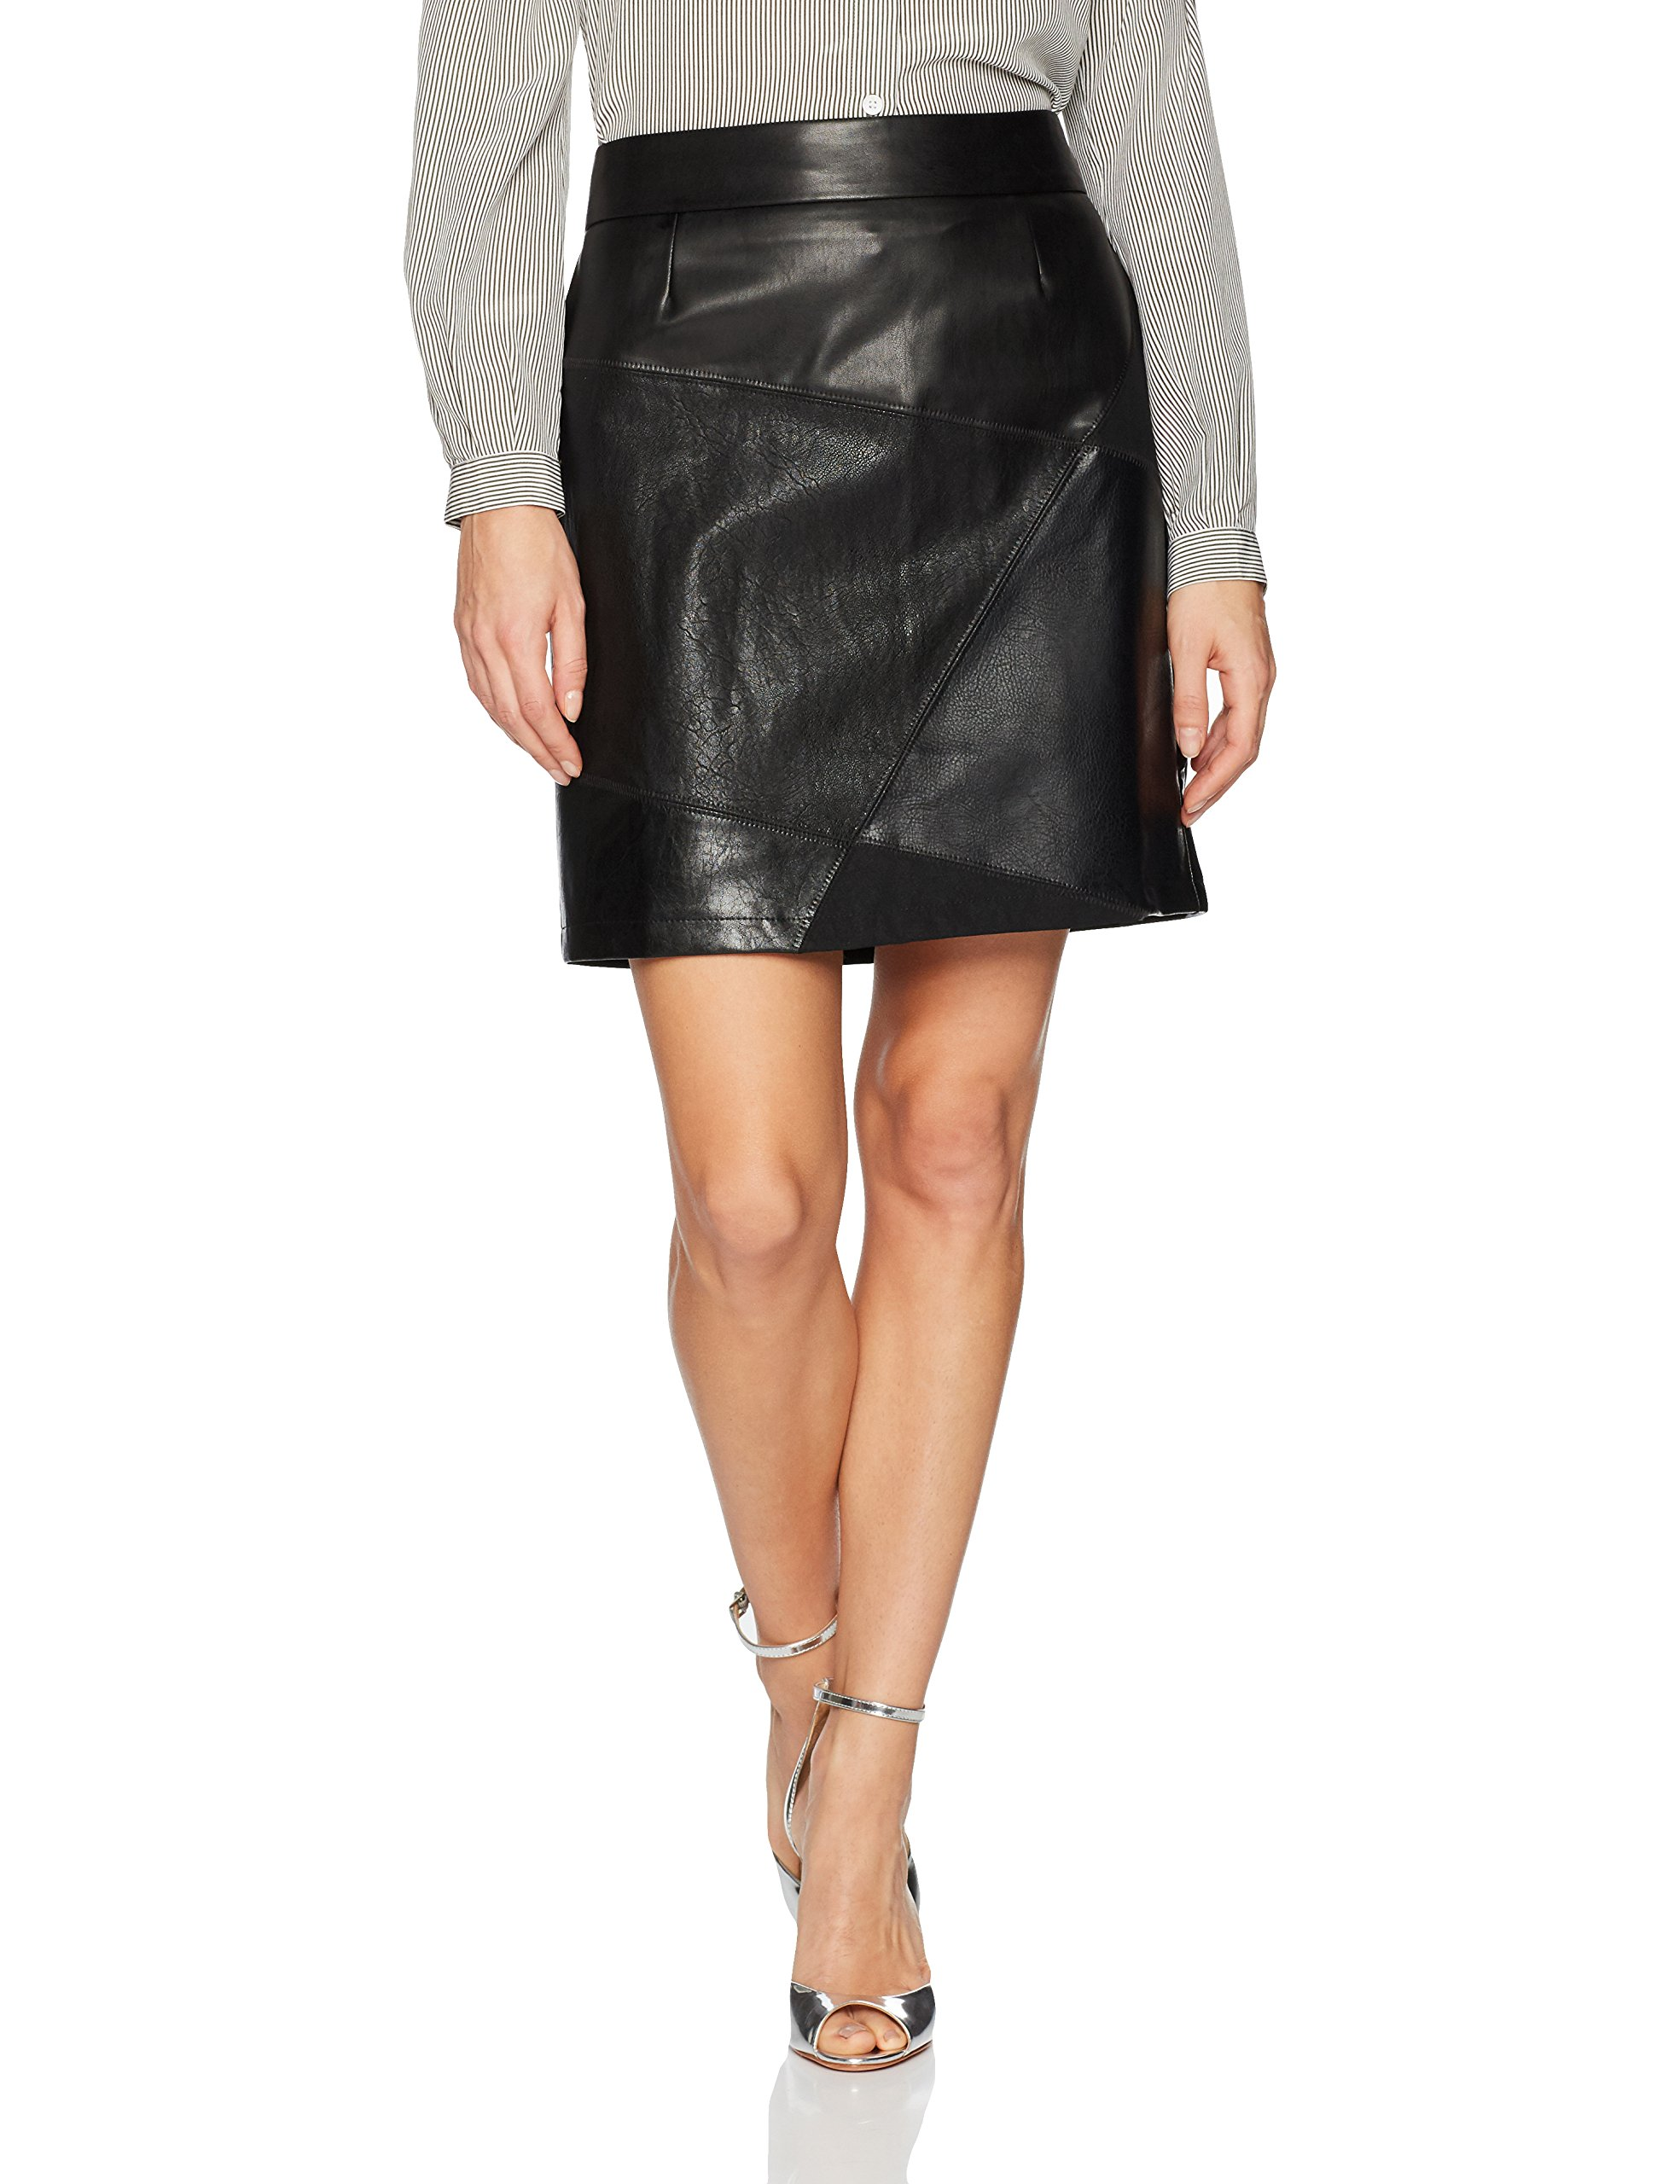 Desigual Women's Henry Woman Woven Short Skirt, black, L